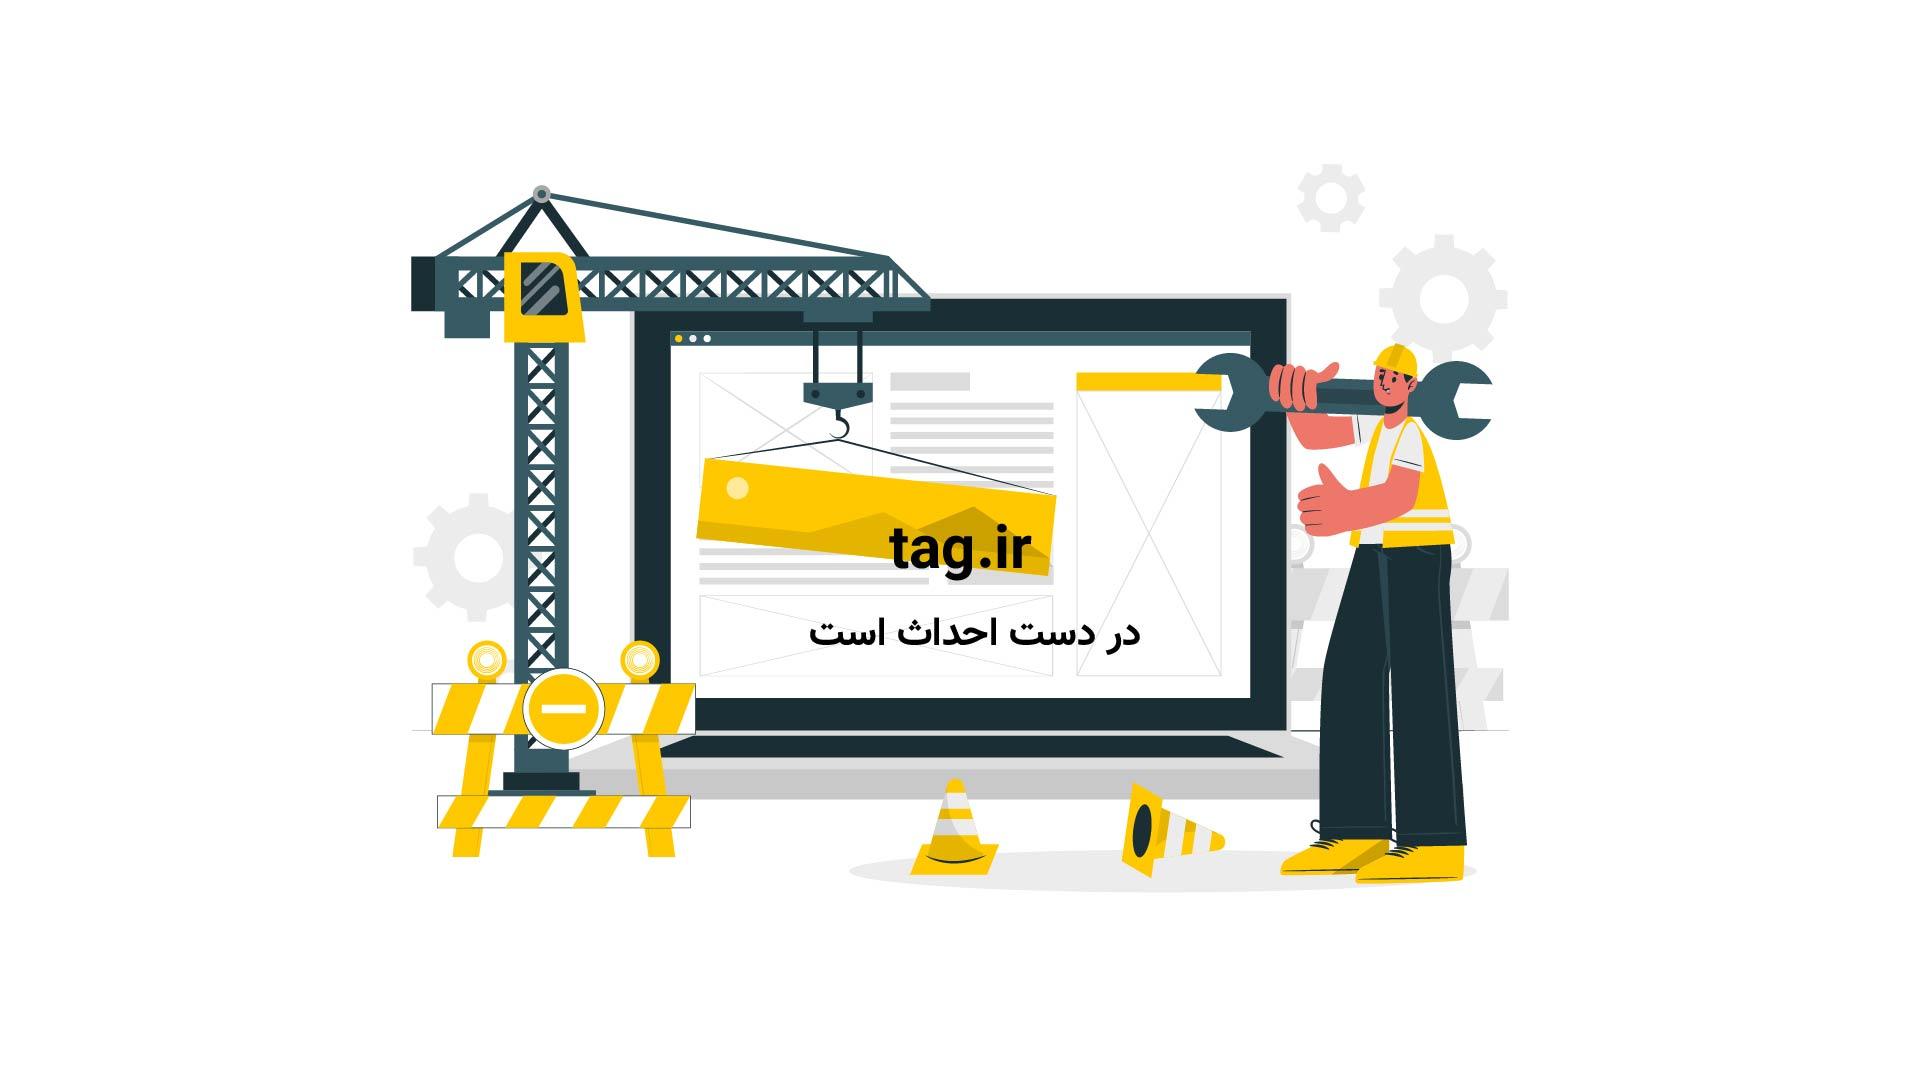 عنکبوت جهنده | تگ